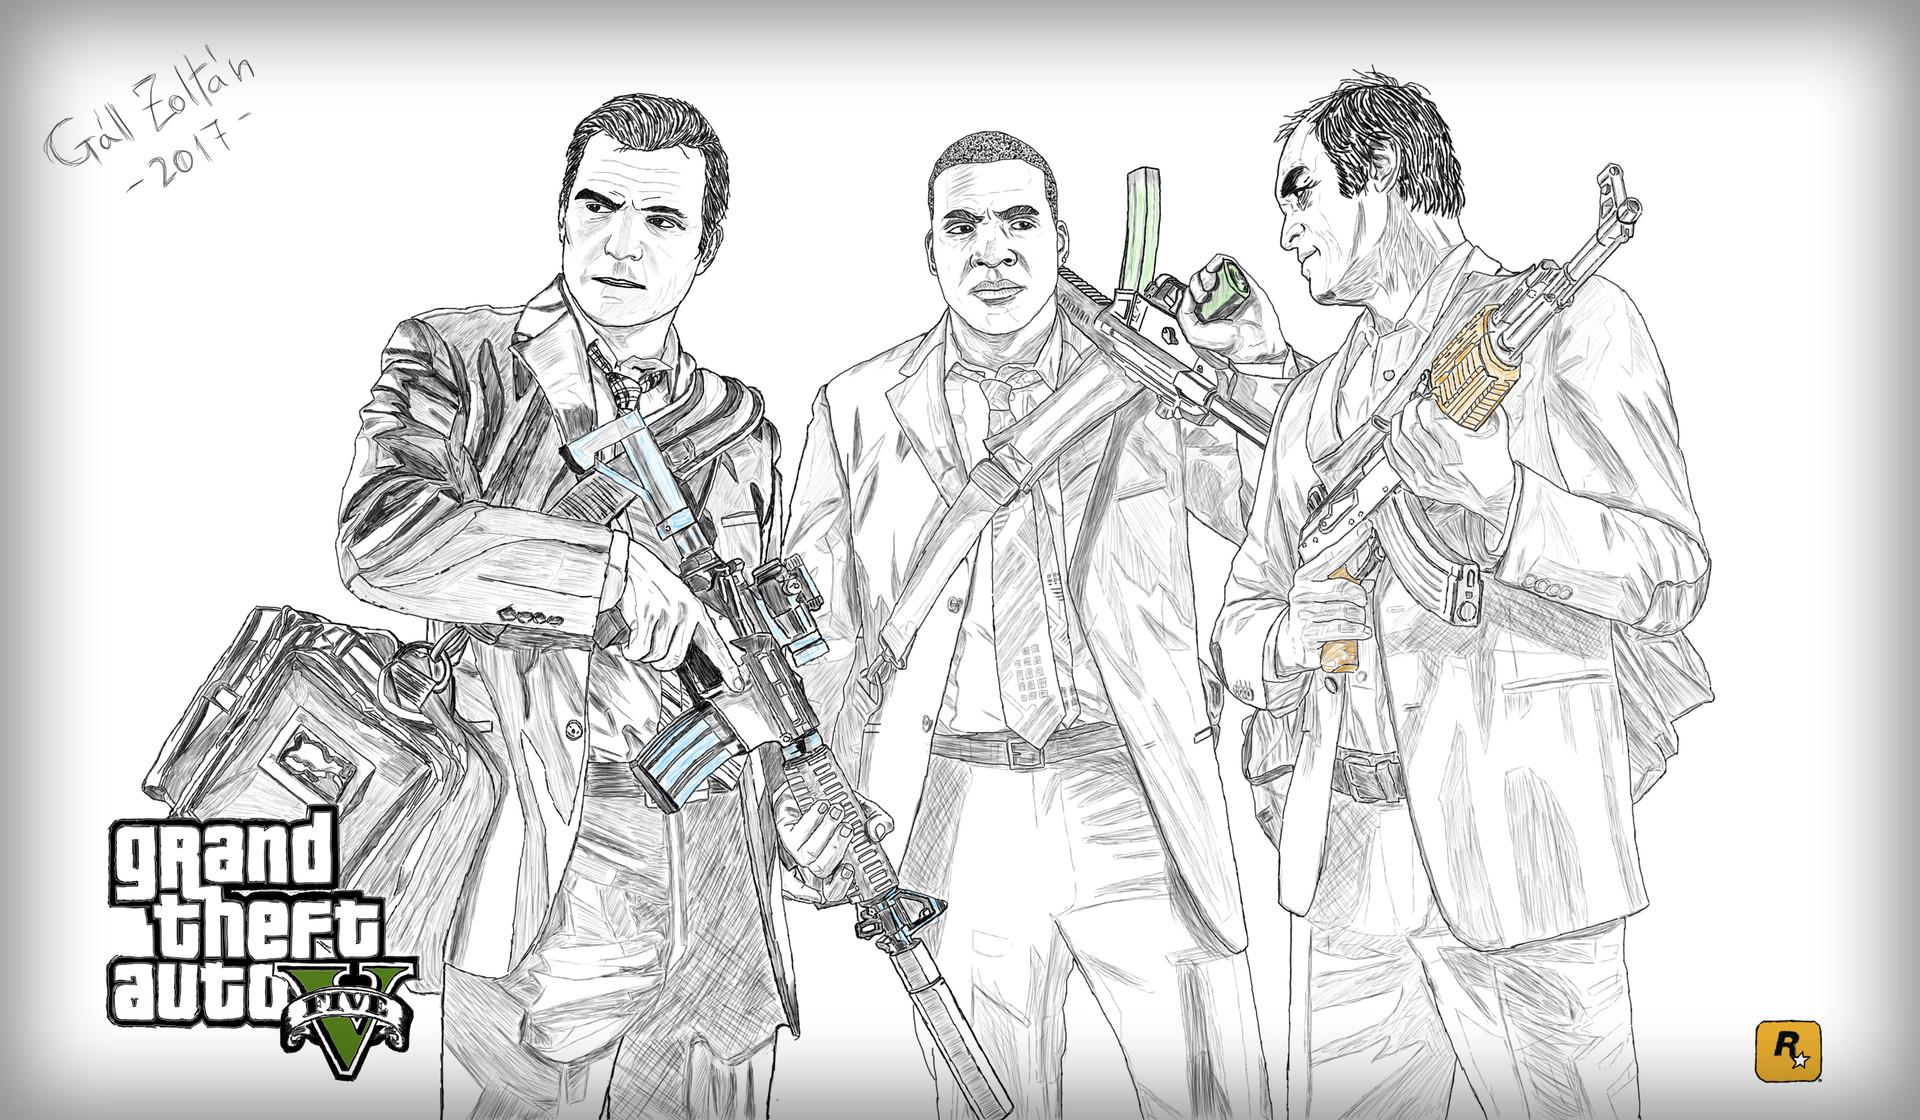 ArtStation - Grand Theft Auto V fanart, Zoltán Gáll